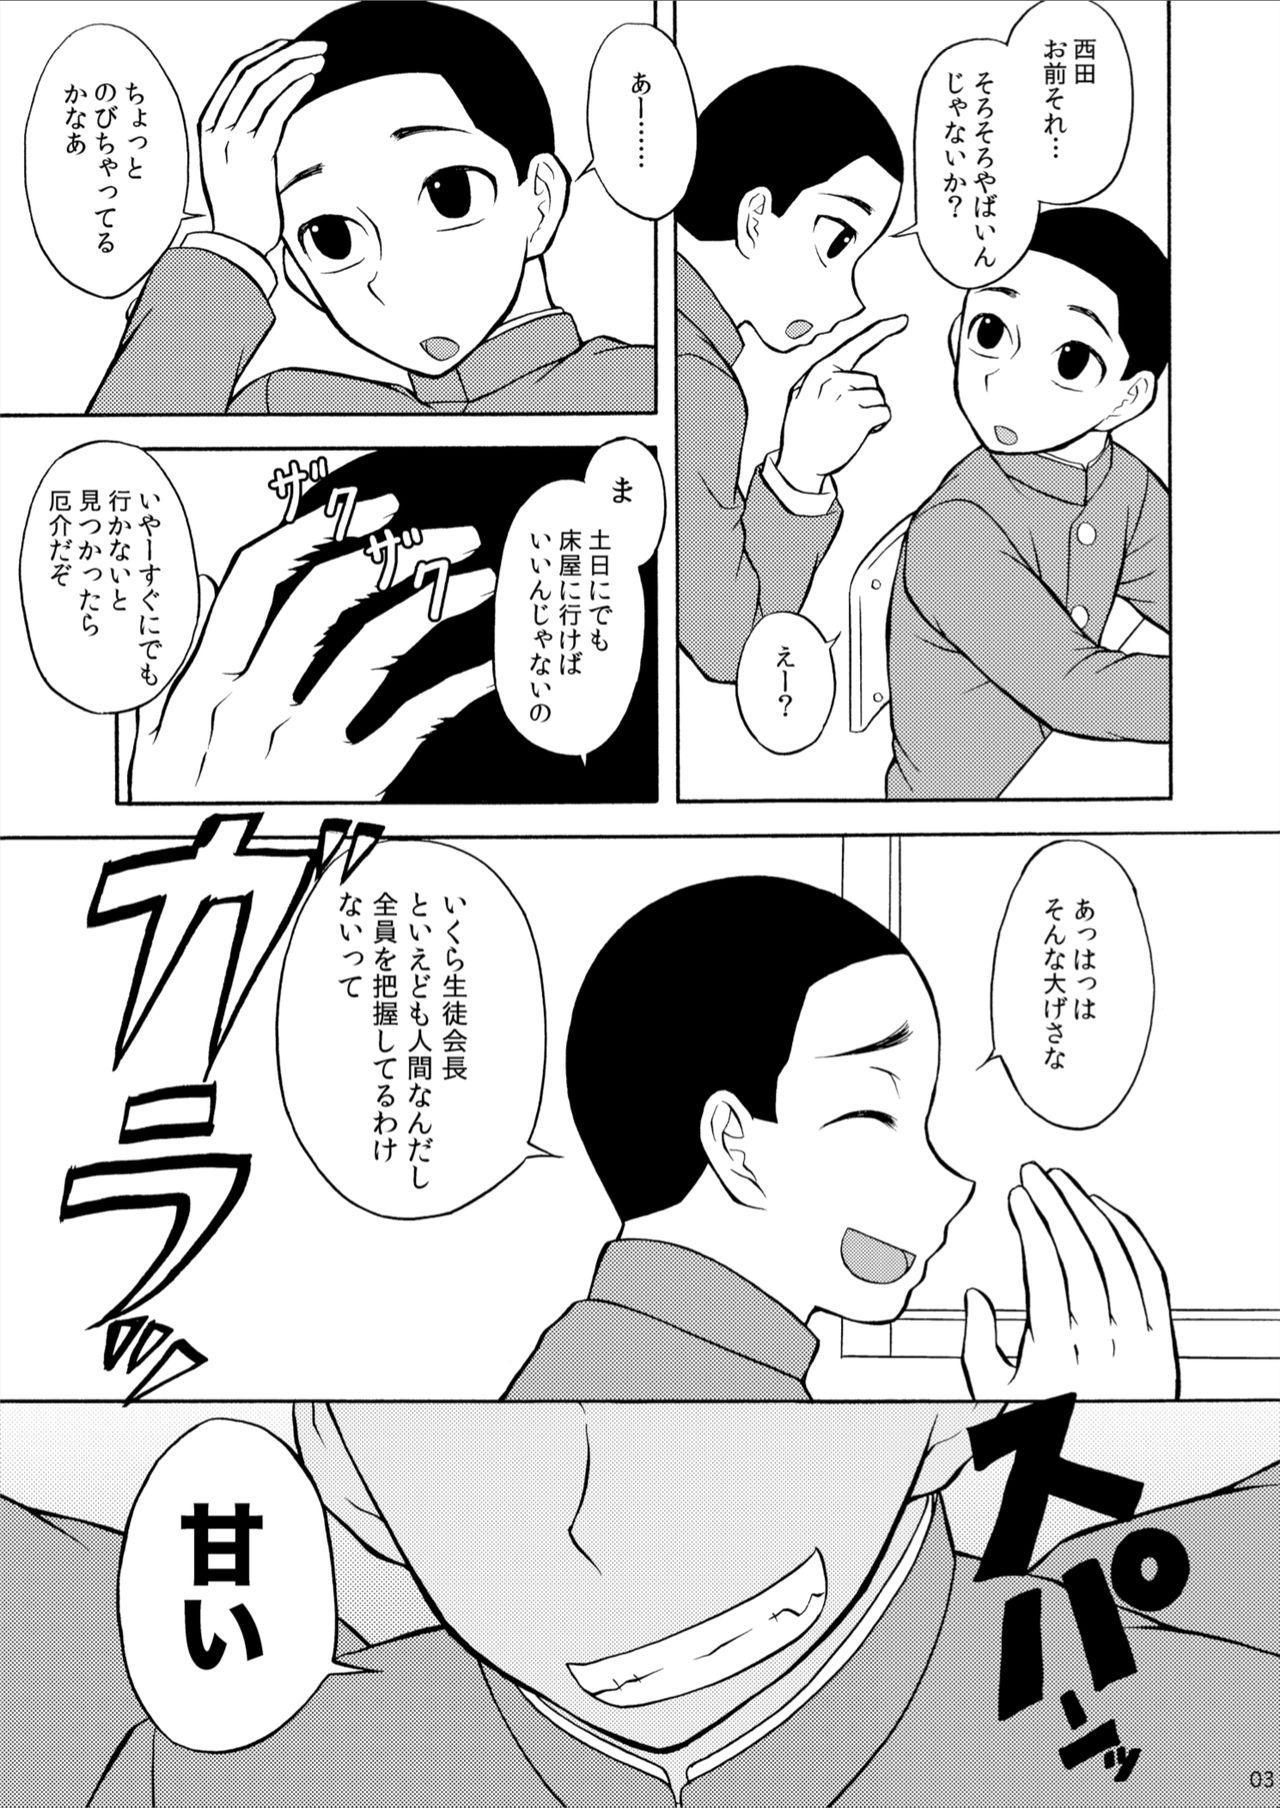 Marugari Jigokuhen 2